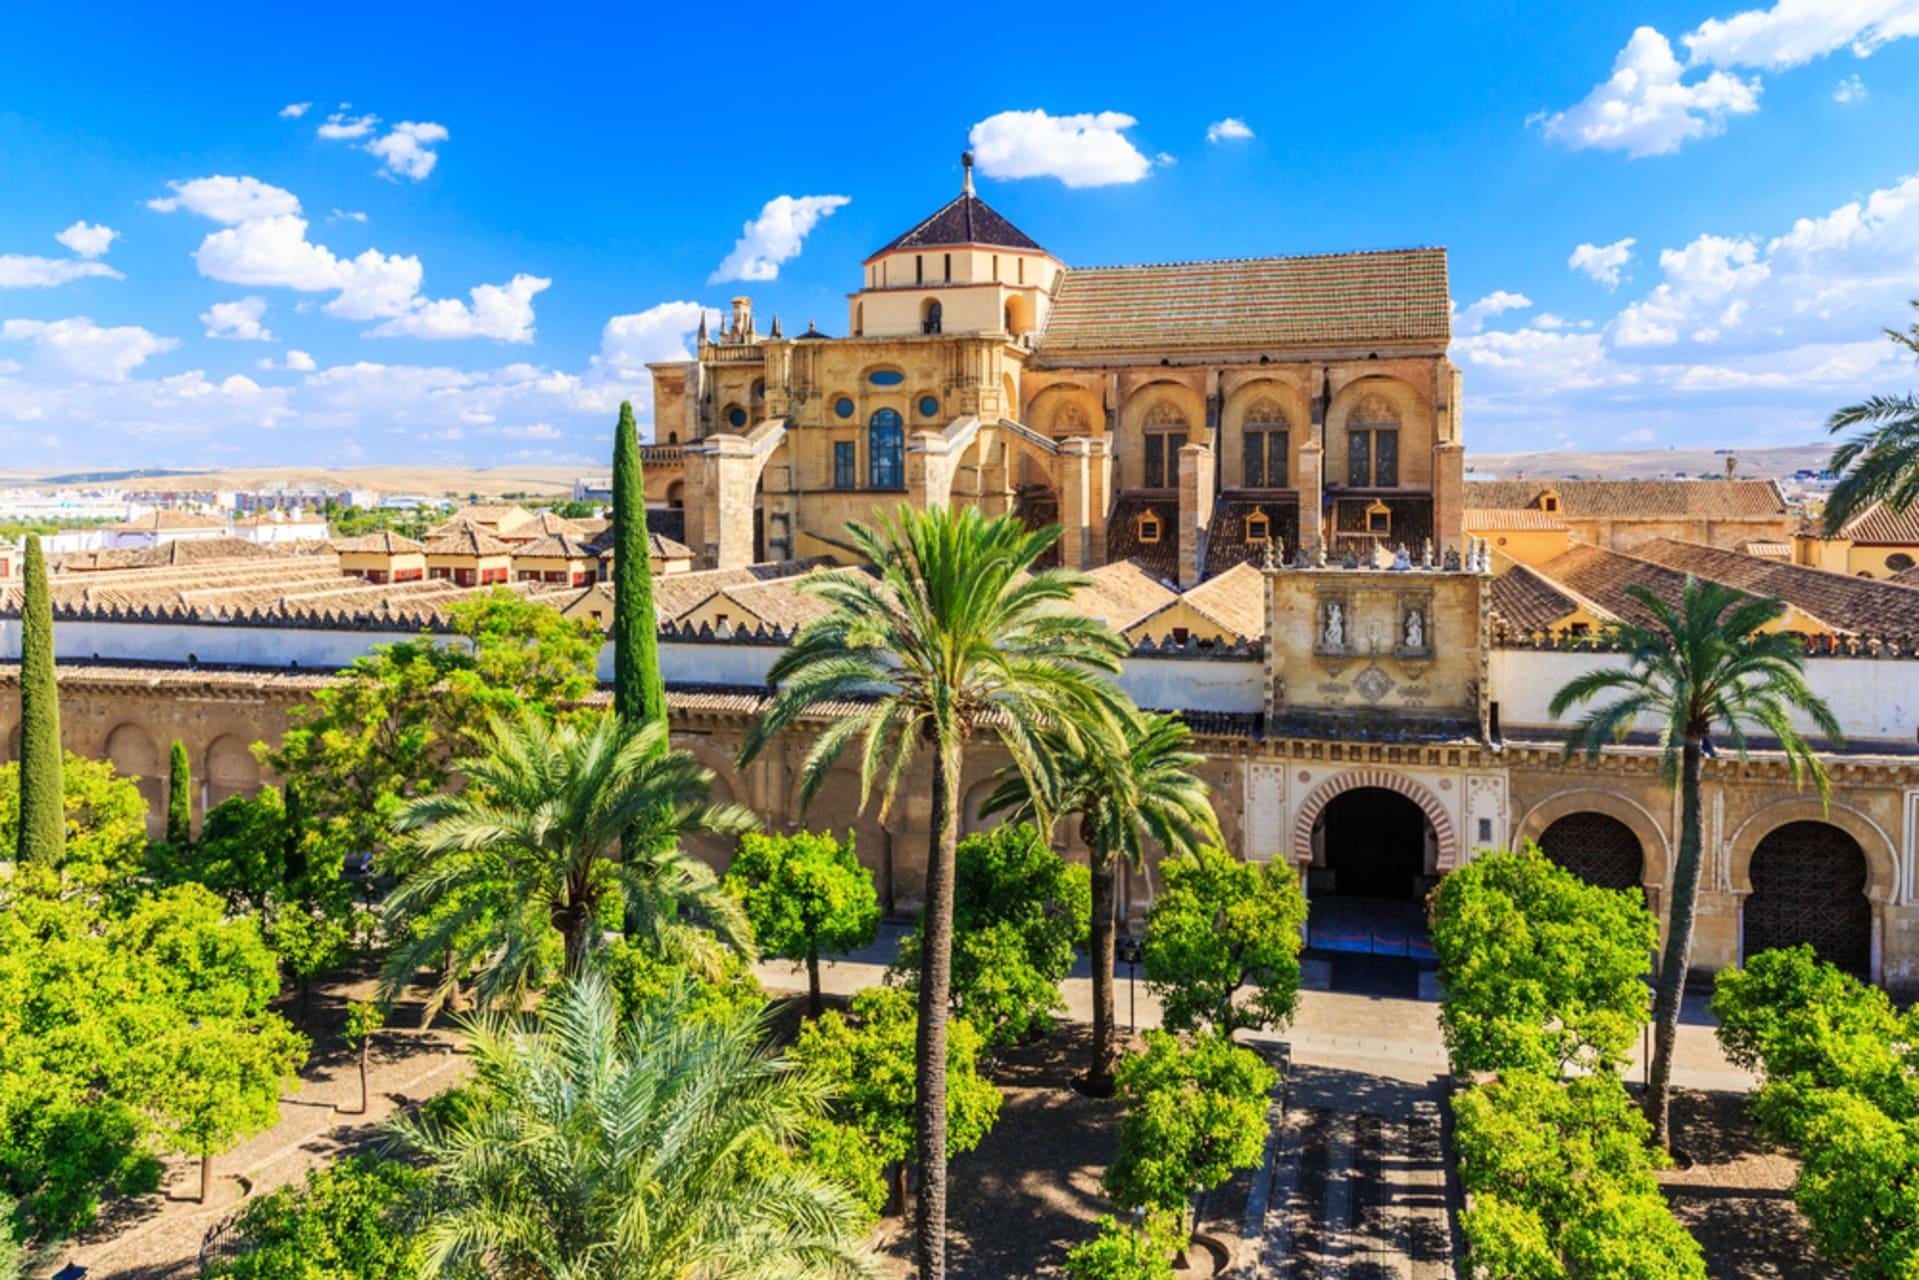 Córdoba - The Medina of Cordoba: The splendor of the Three Cultures.